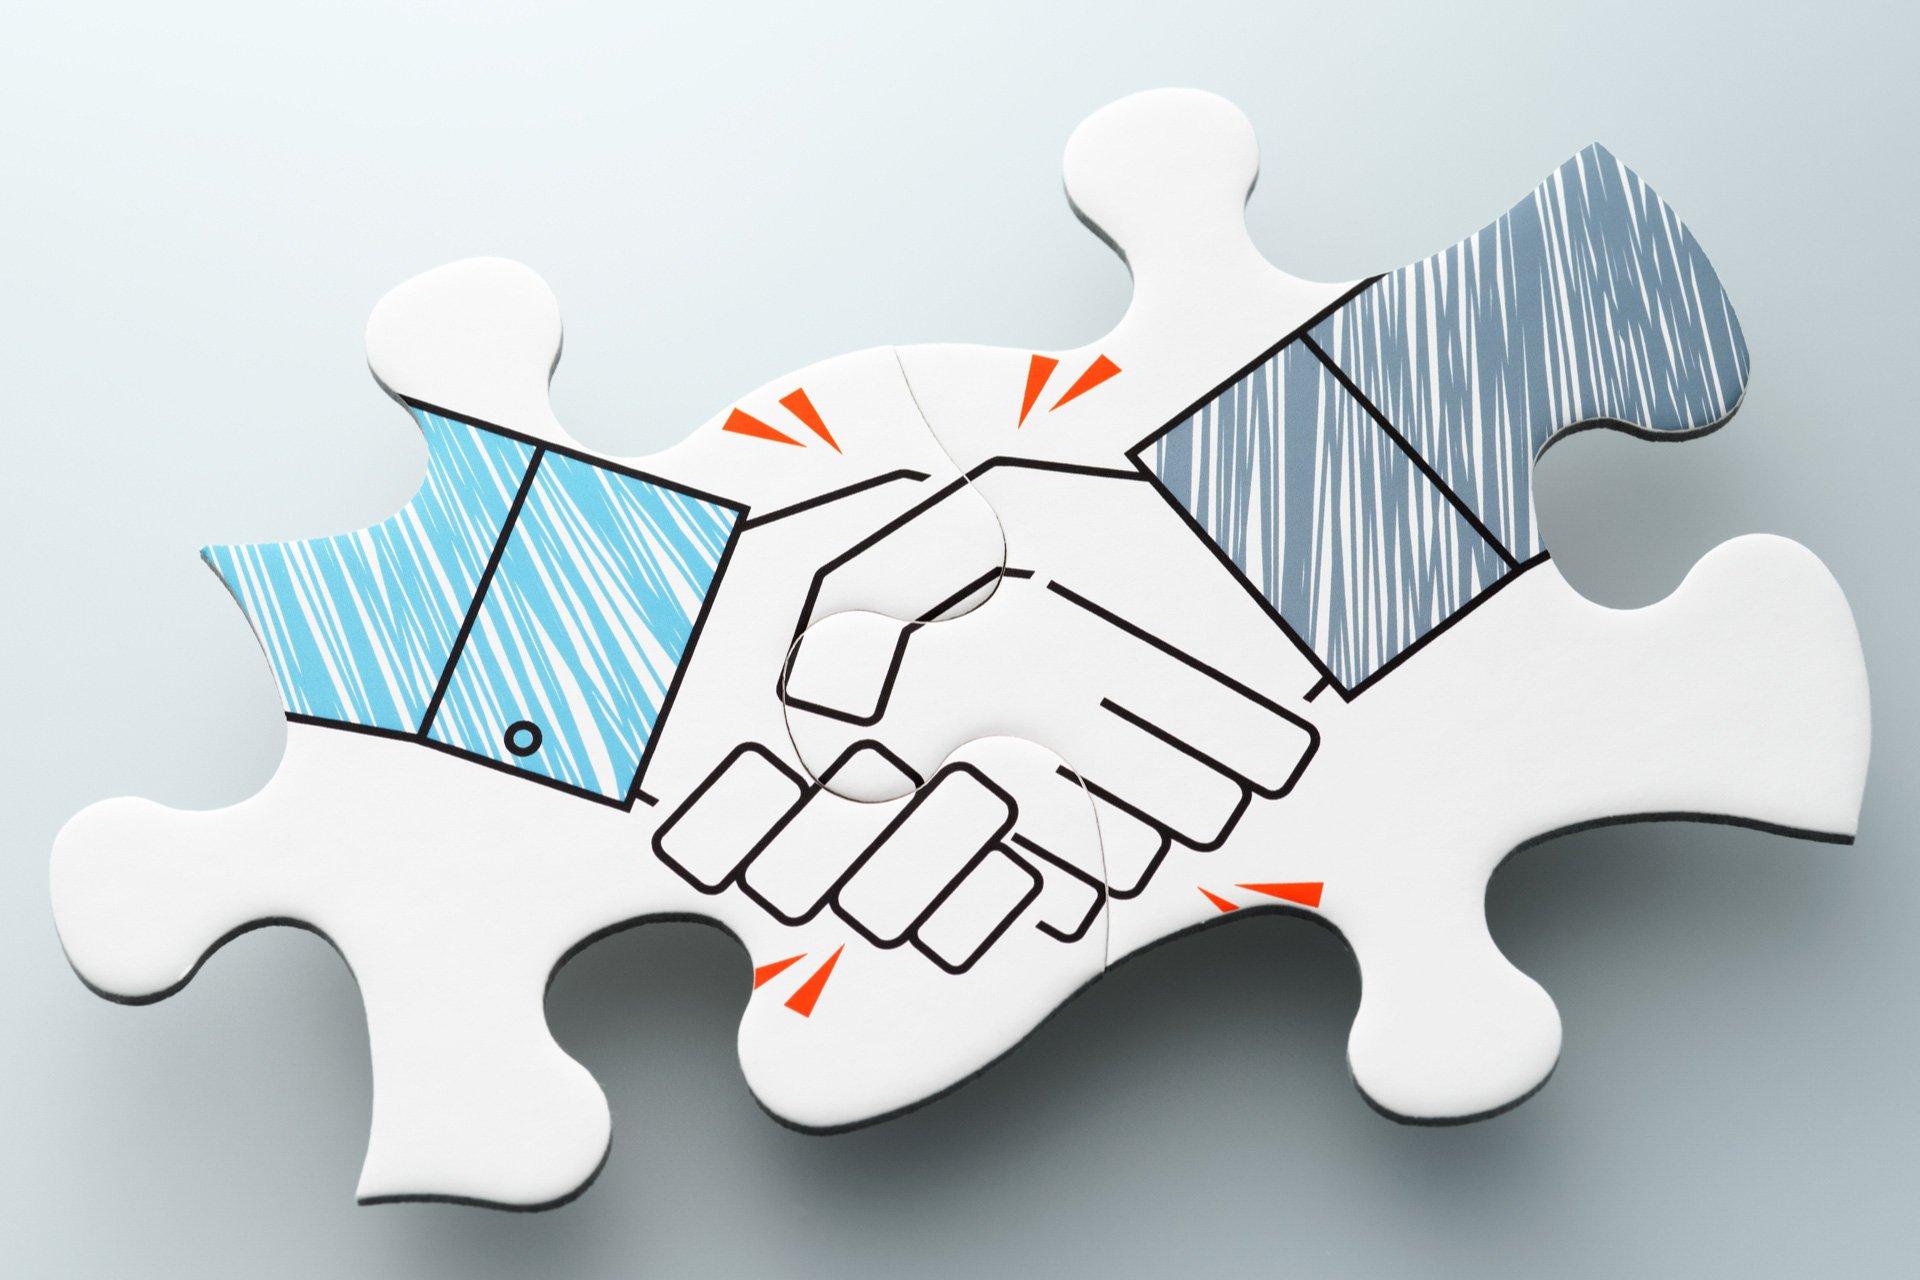 school-business partnership